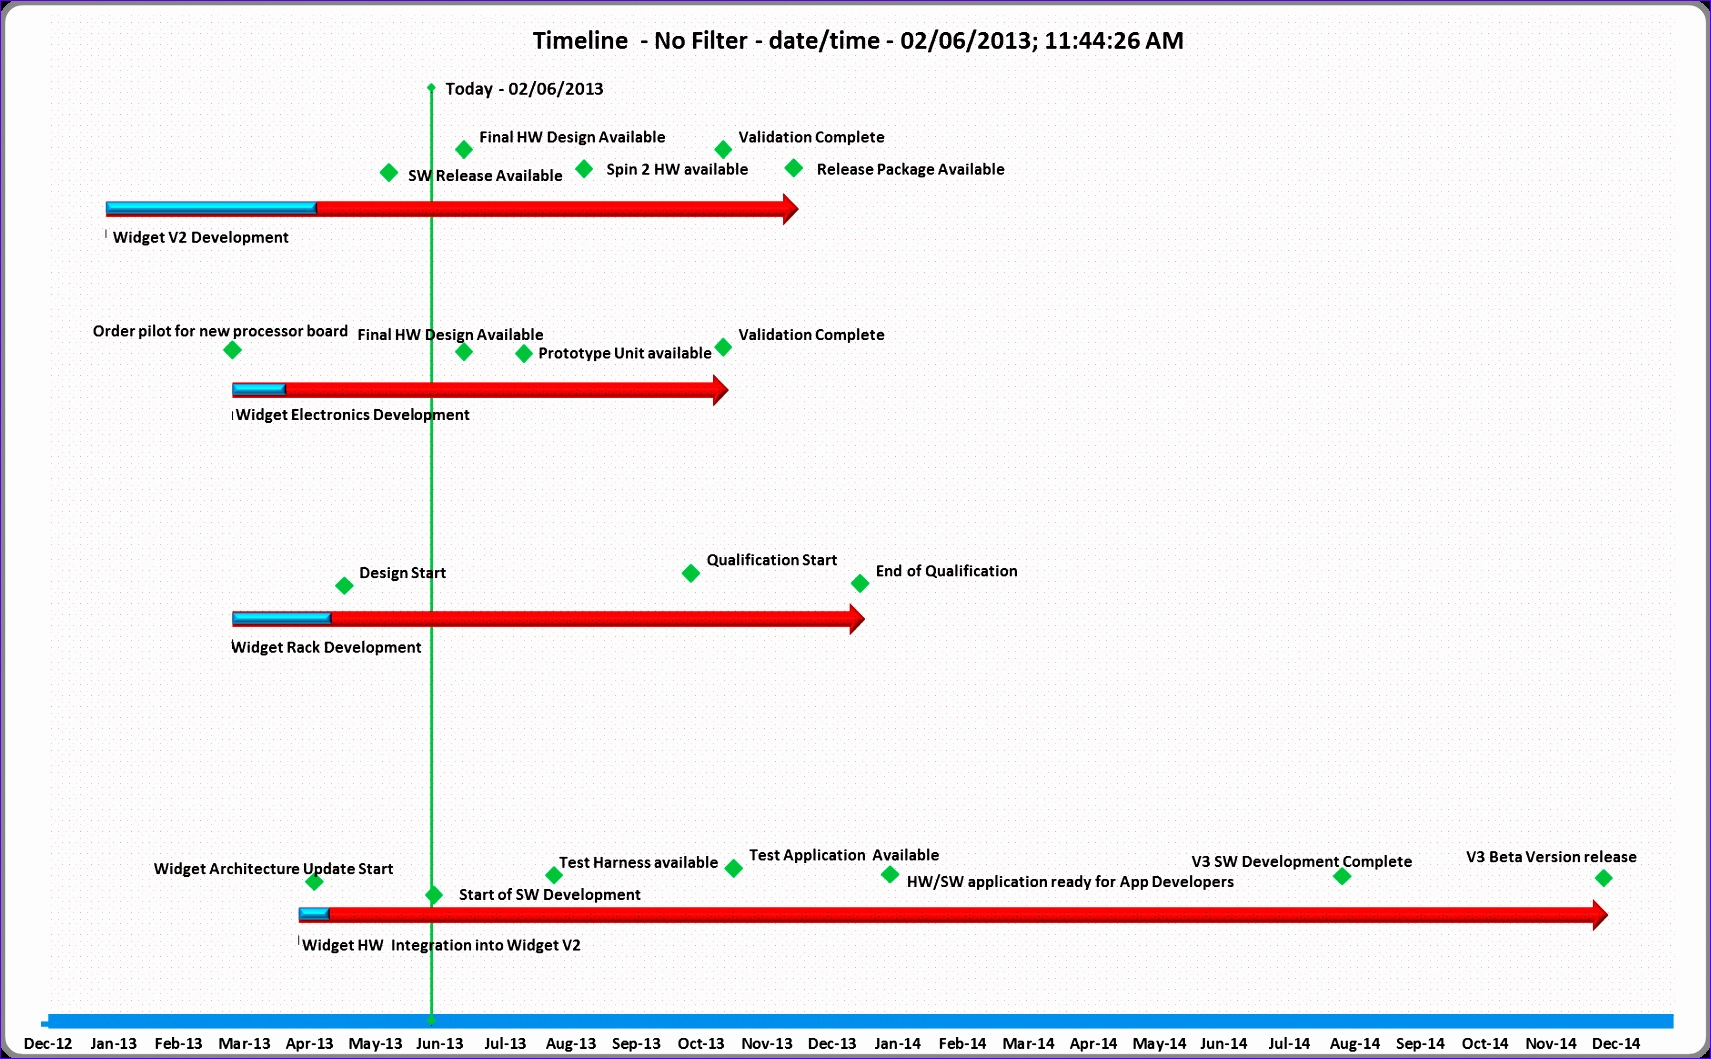 Wid HW SW Timeline Type 4